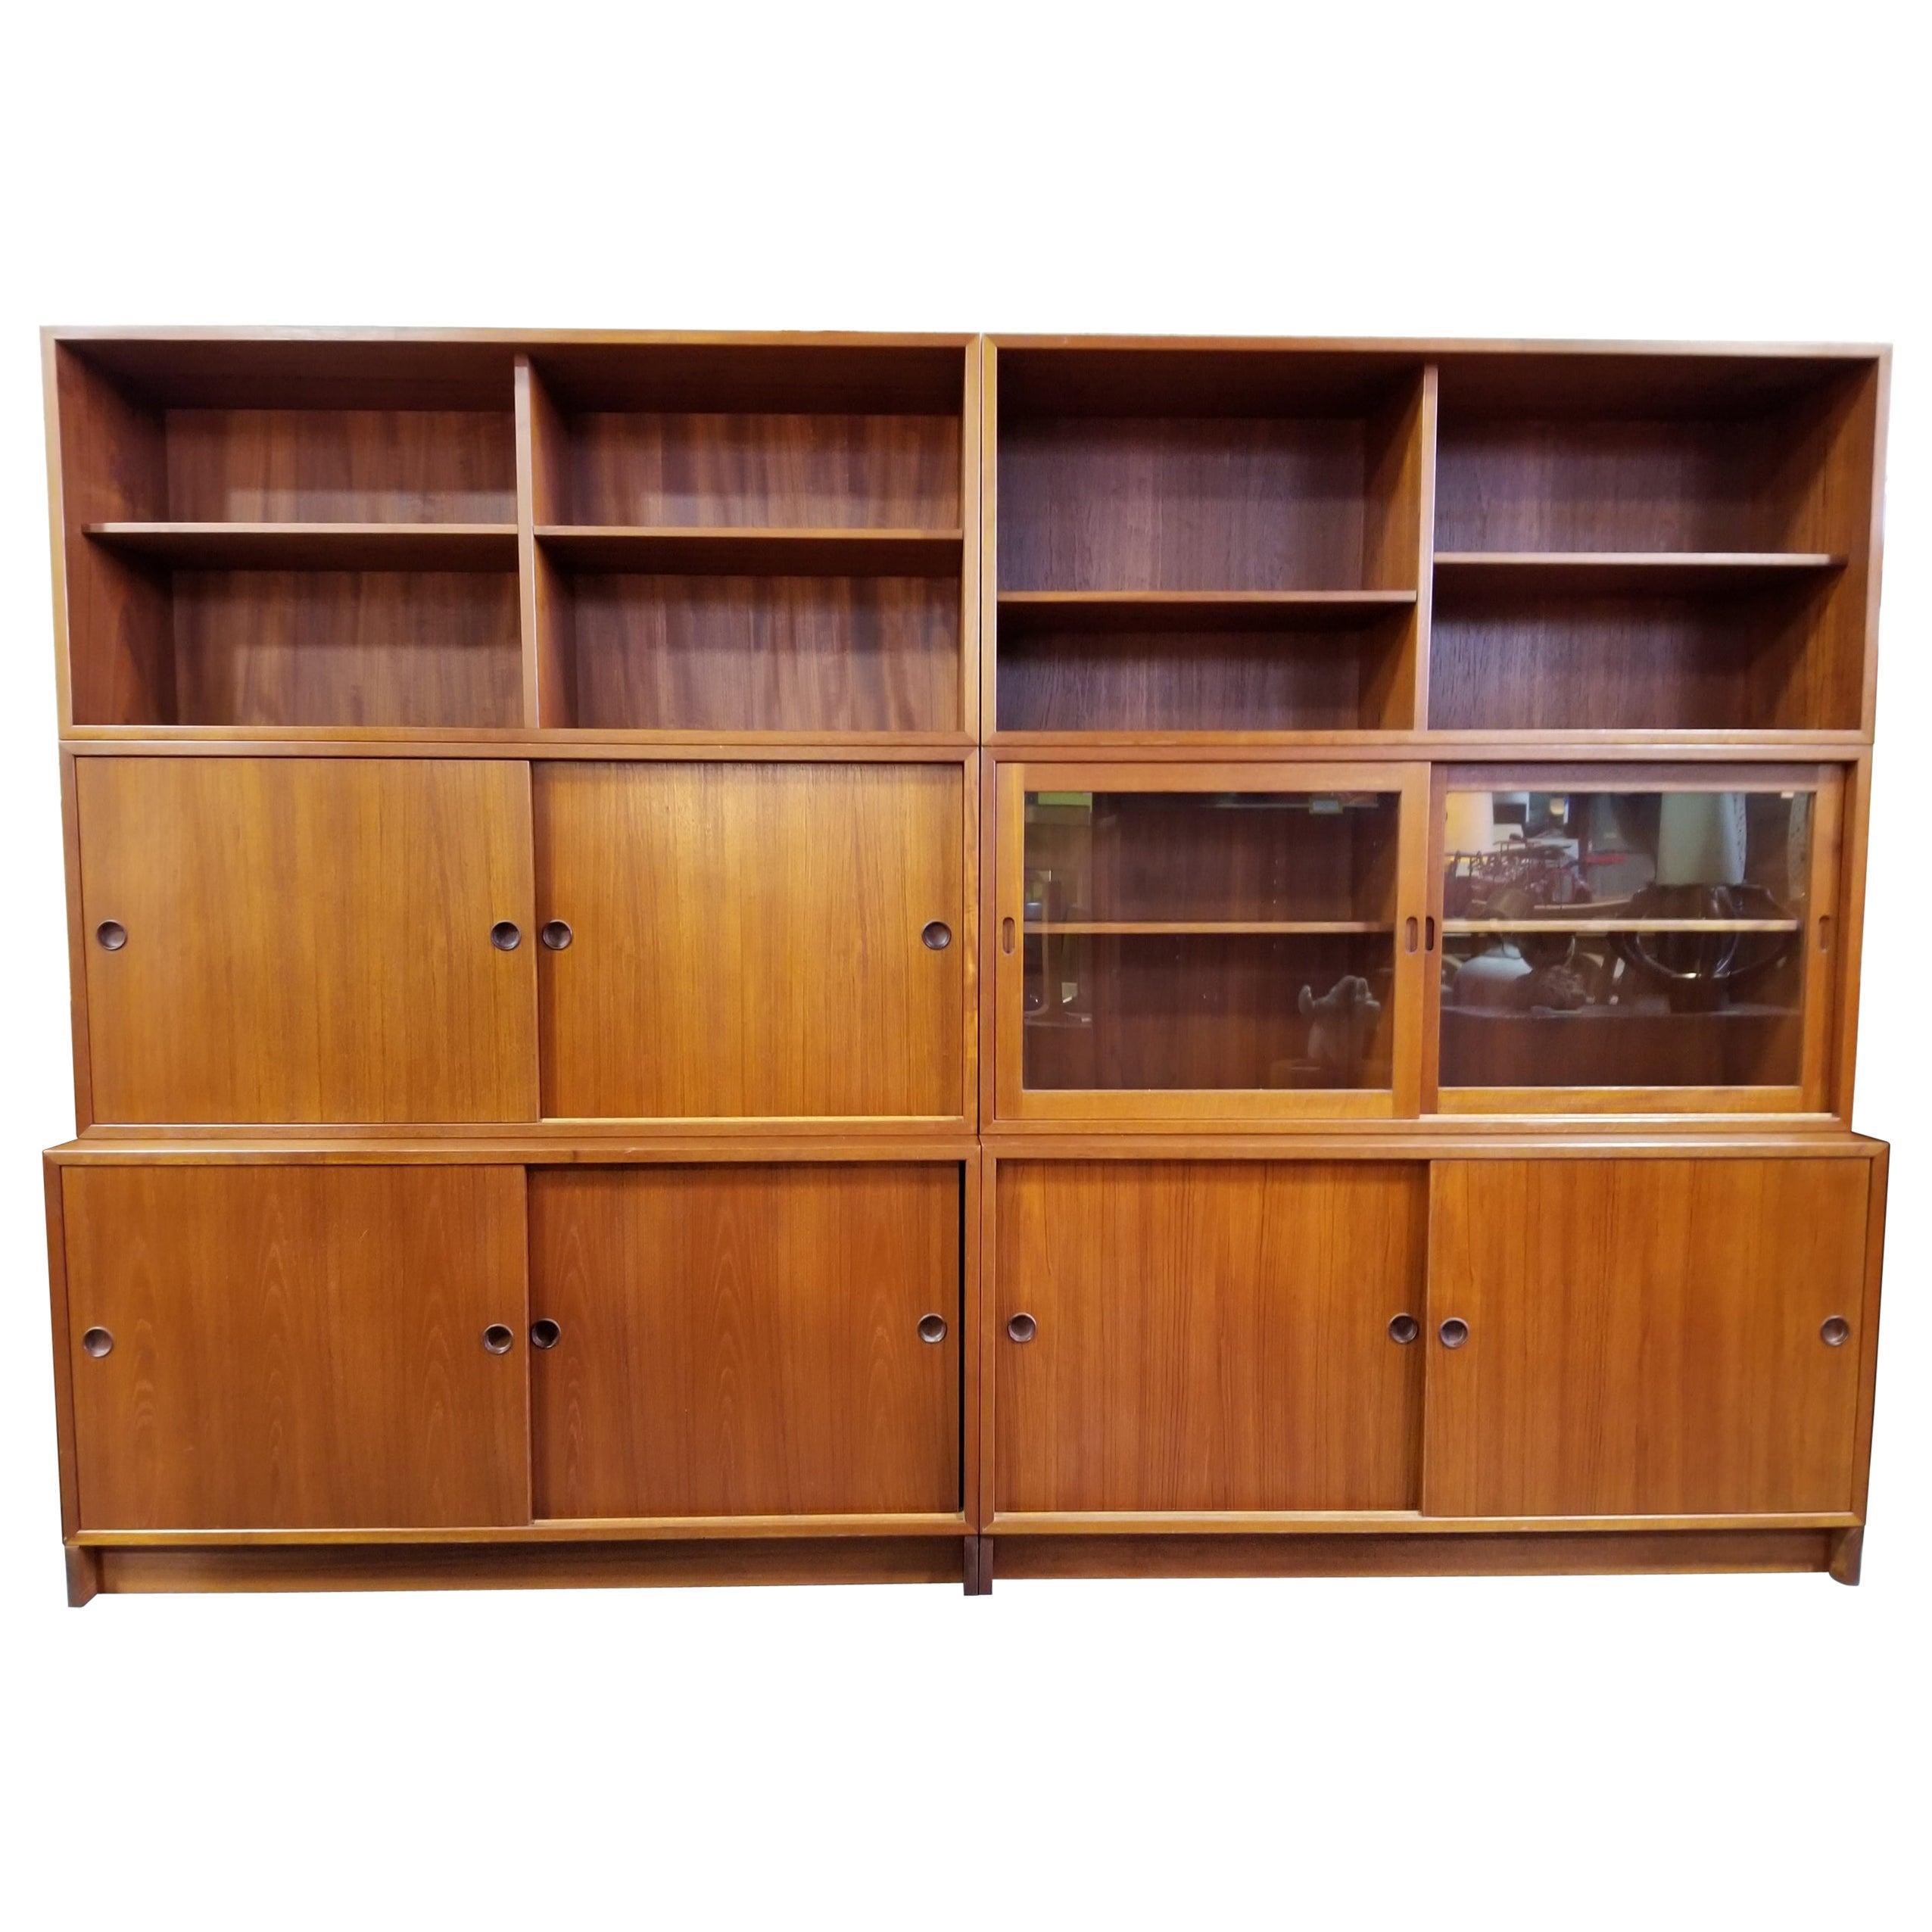 Borge Mogensen Teak Wall Unit / Bookcase